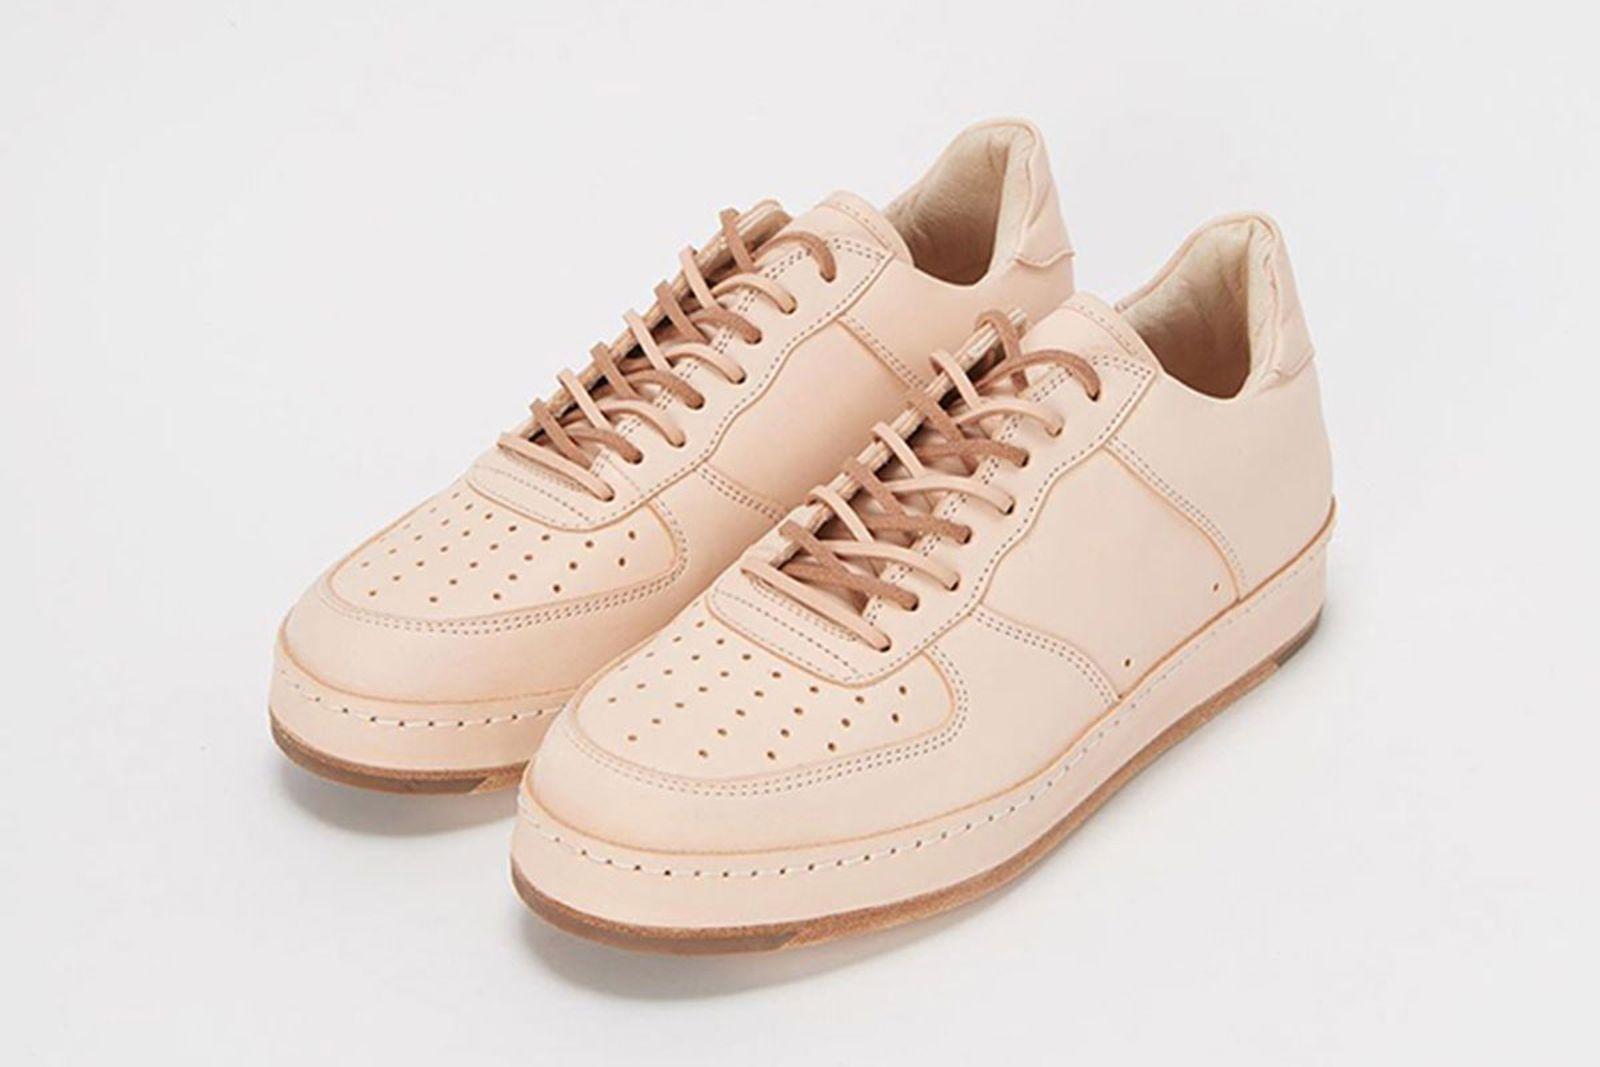 cocina Estéril Sur  Hender Scheme Gives the Nike Air Force 1 the Luxe Leather Treatment